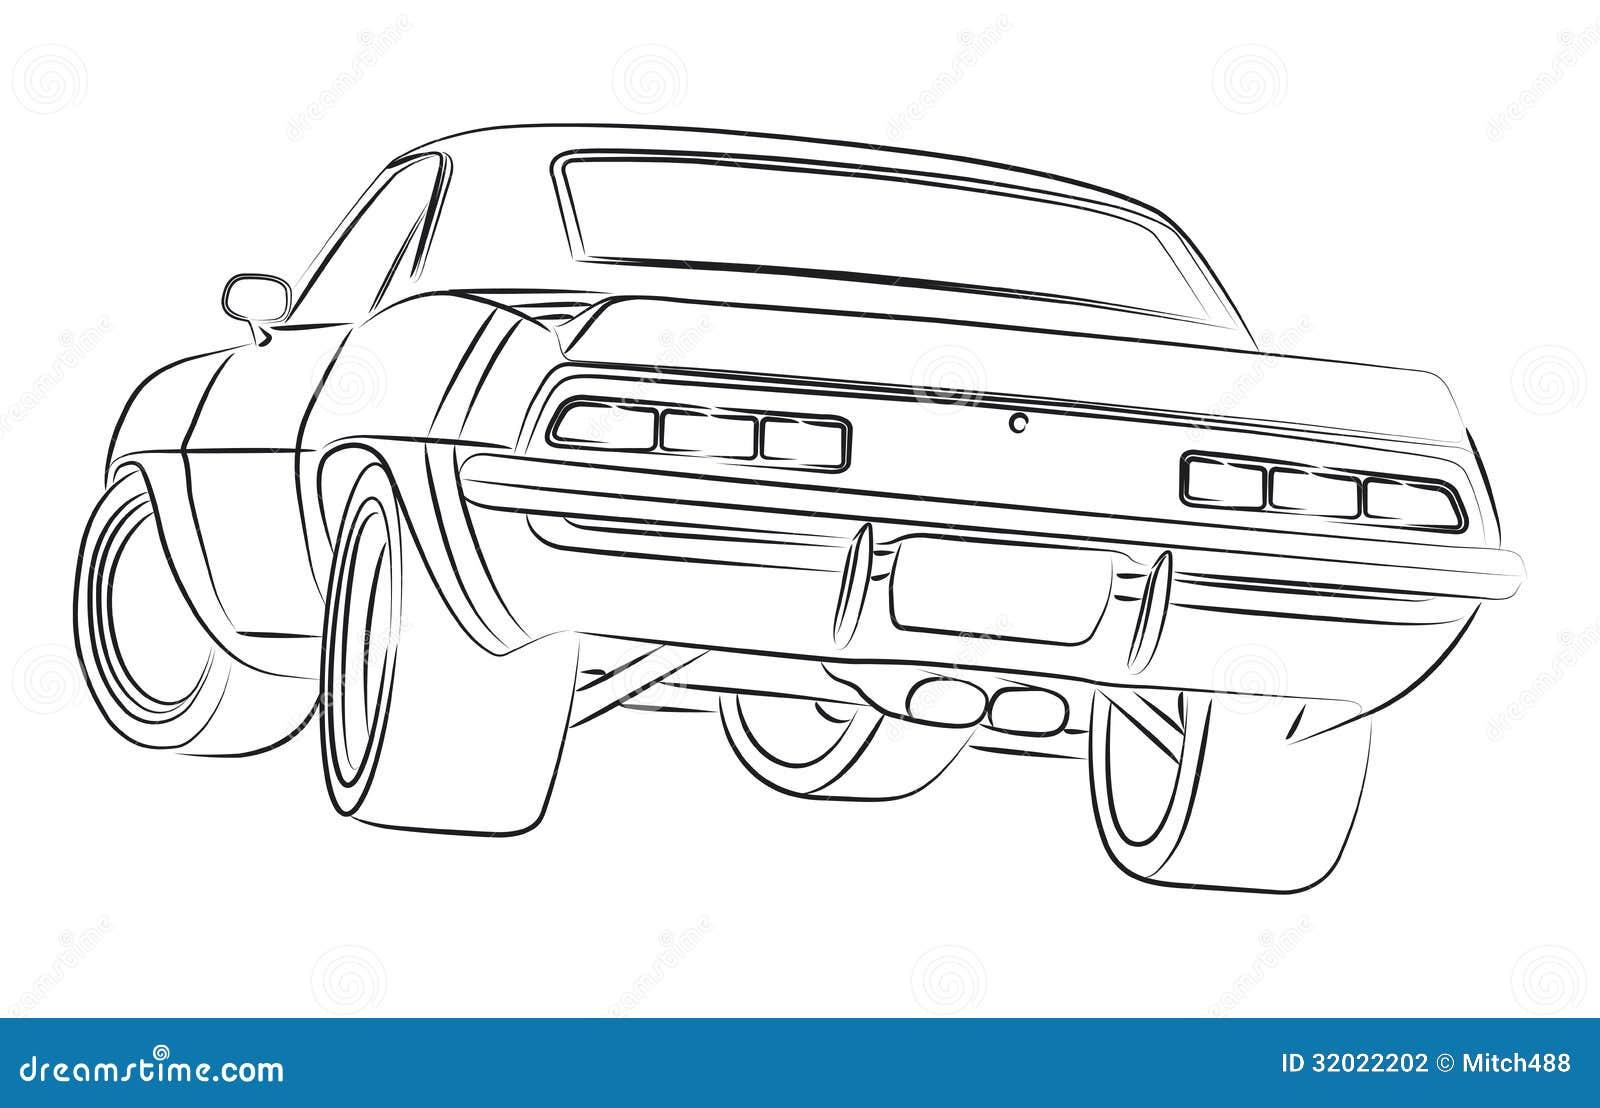 Muscle Car Ilustration Stock Illustration Illustration Of Auto